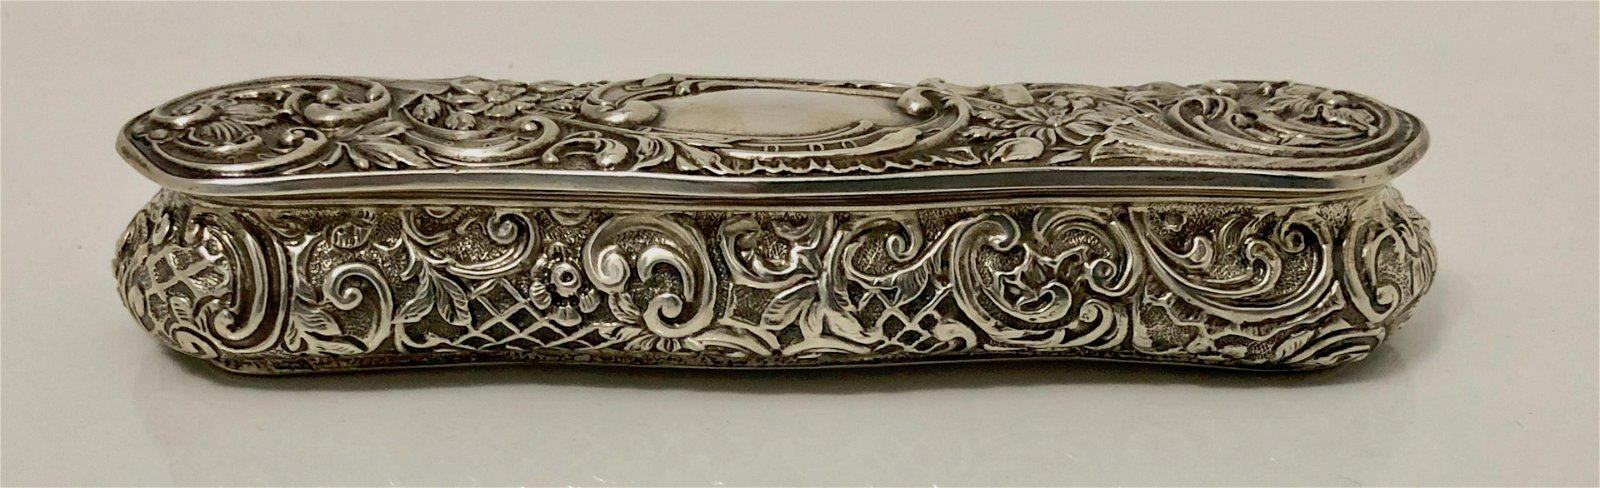 Antique Victorian Sterling Silver Repousse Box